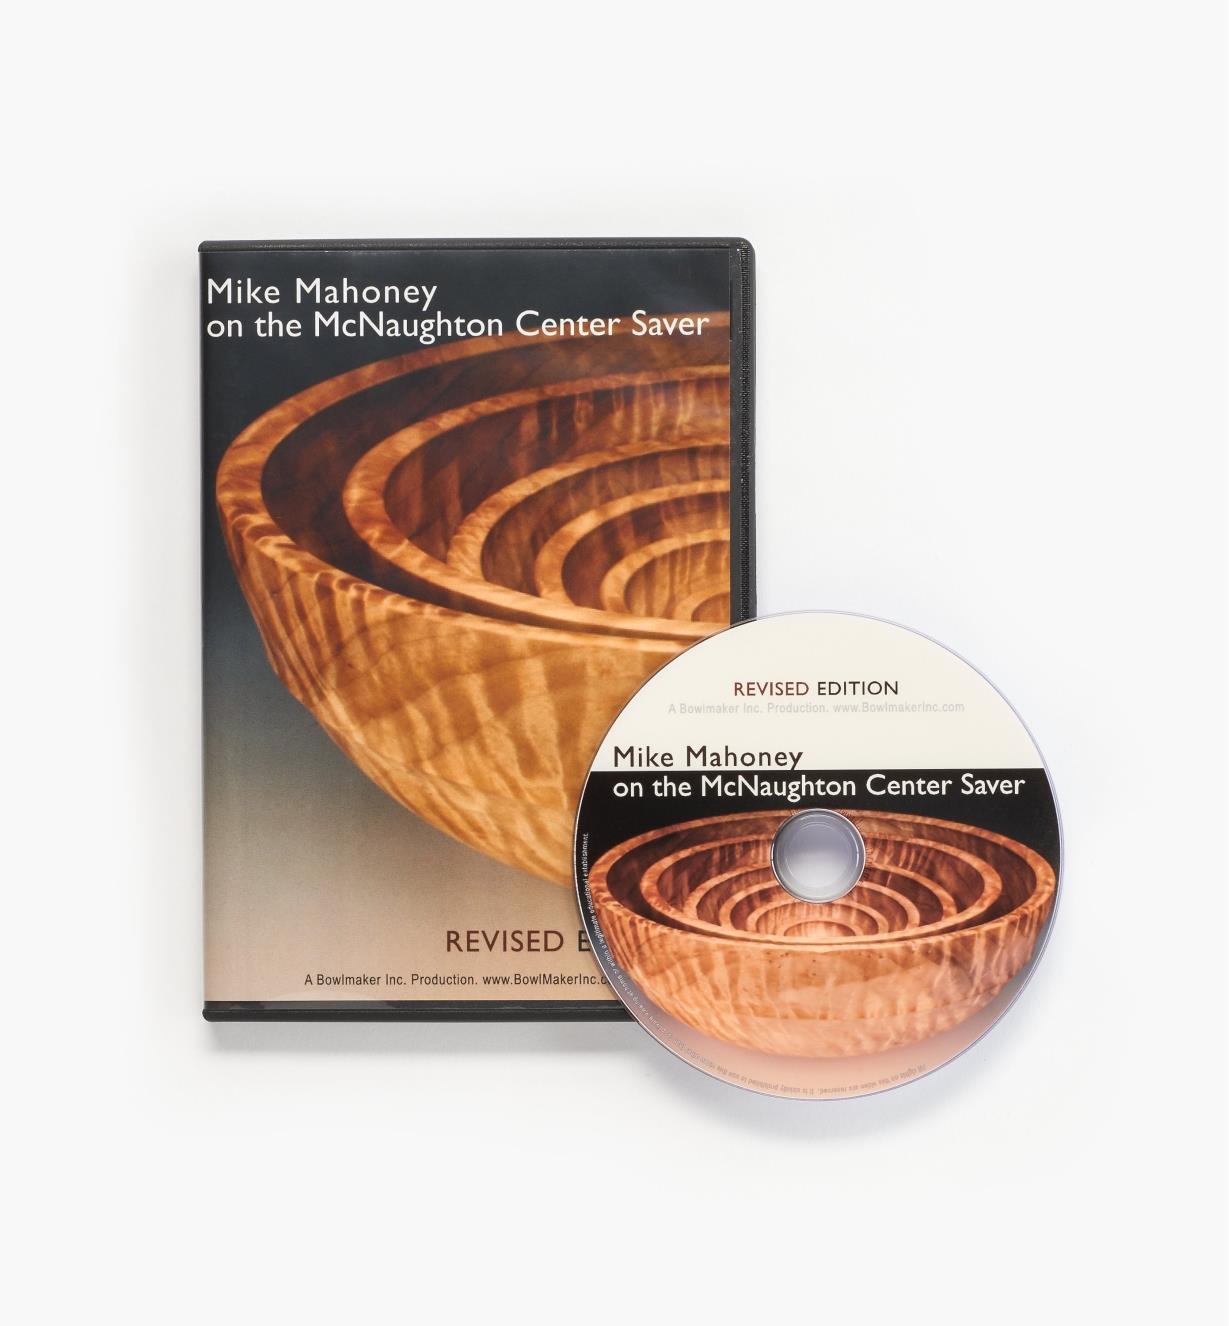 26L3203 - Mike Mahoney on the McNaughton Center Saver – DVD